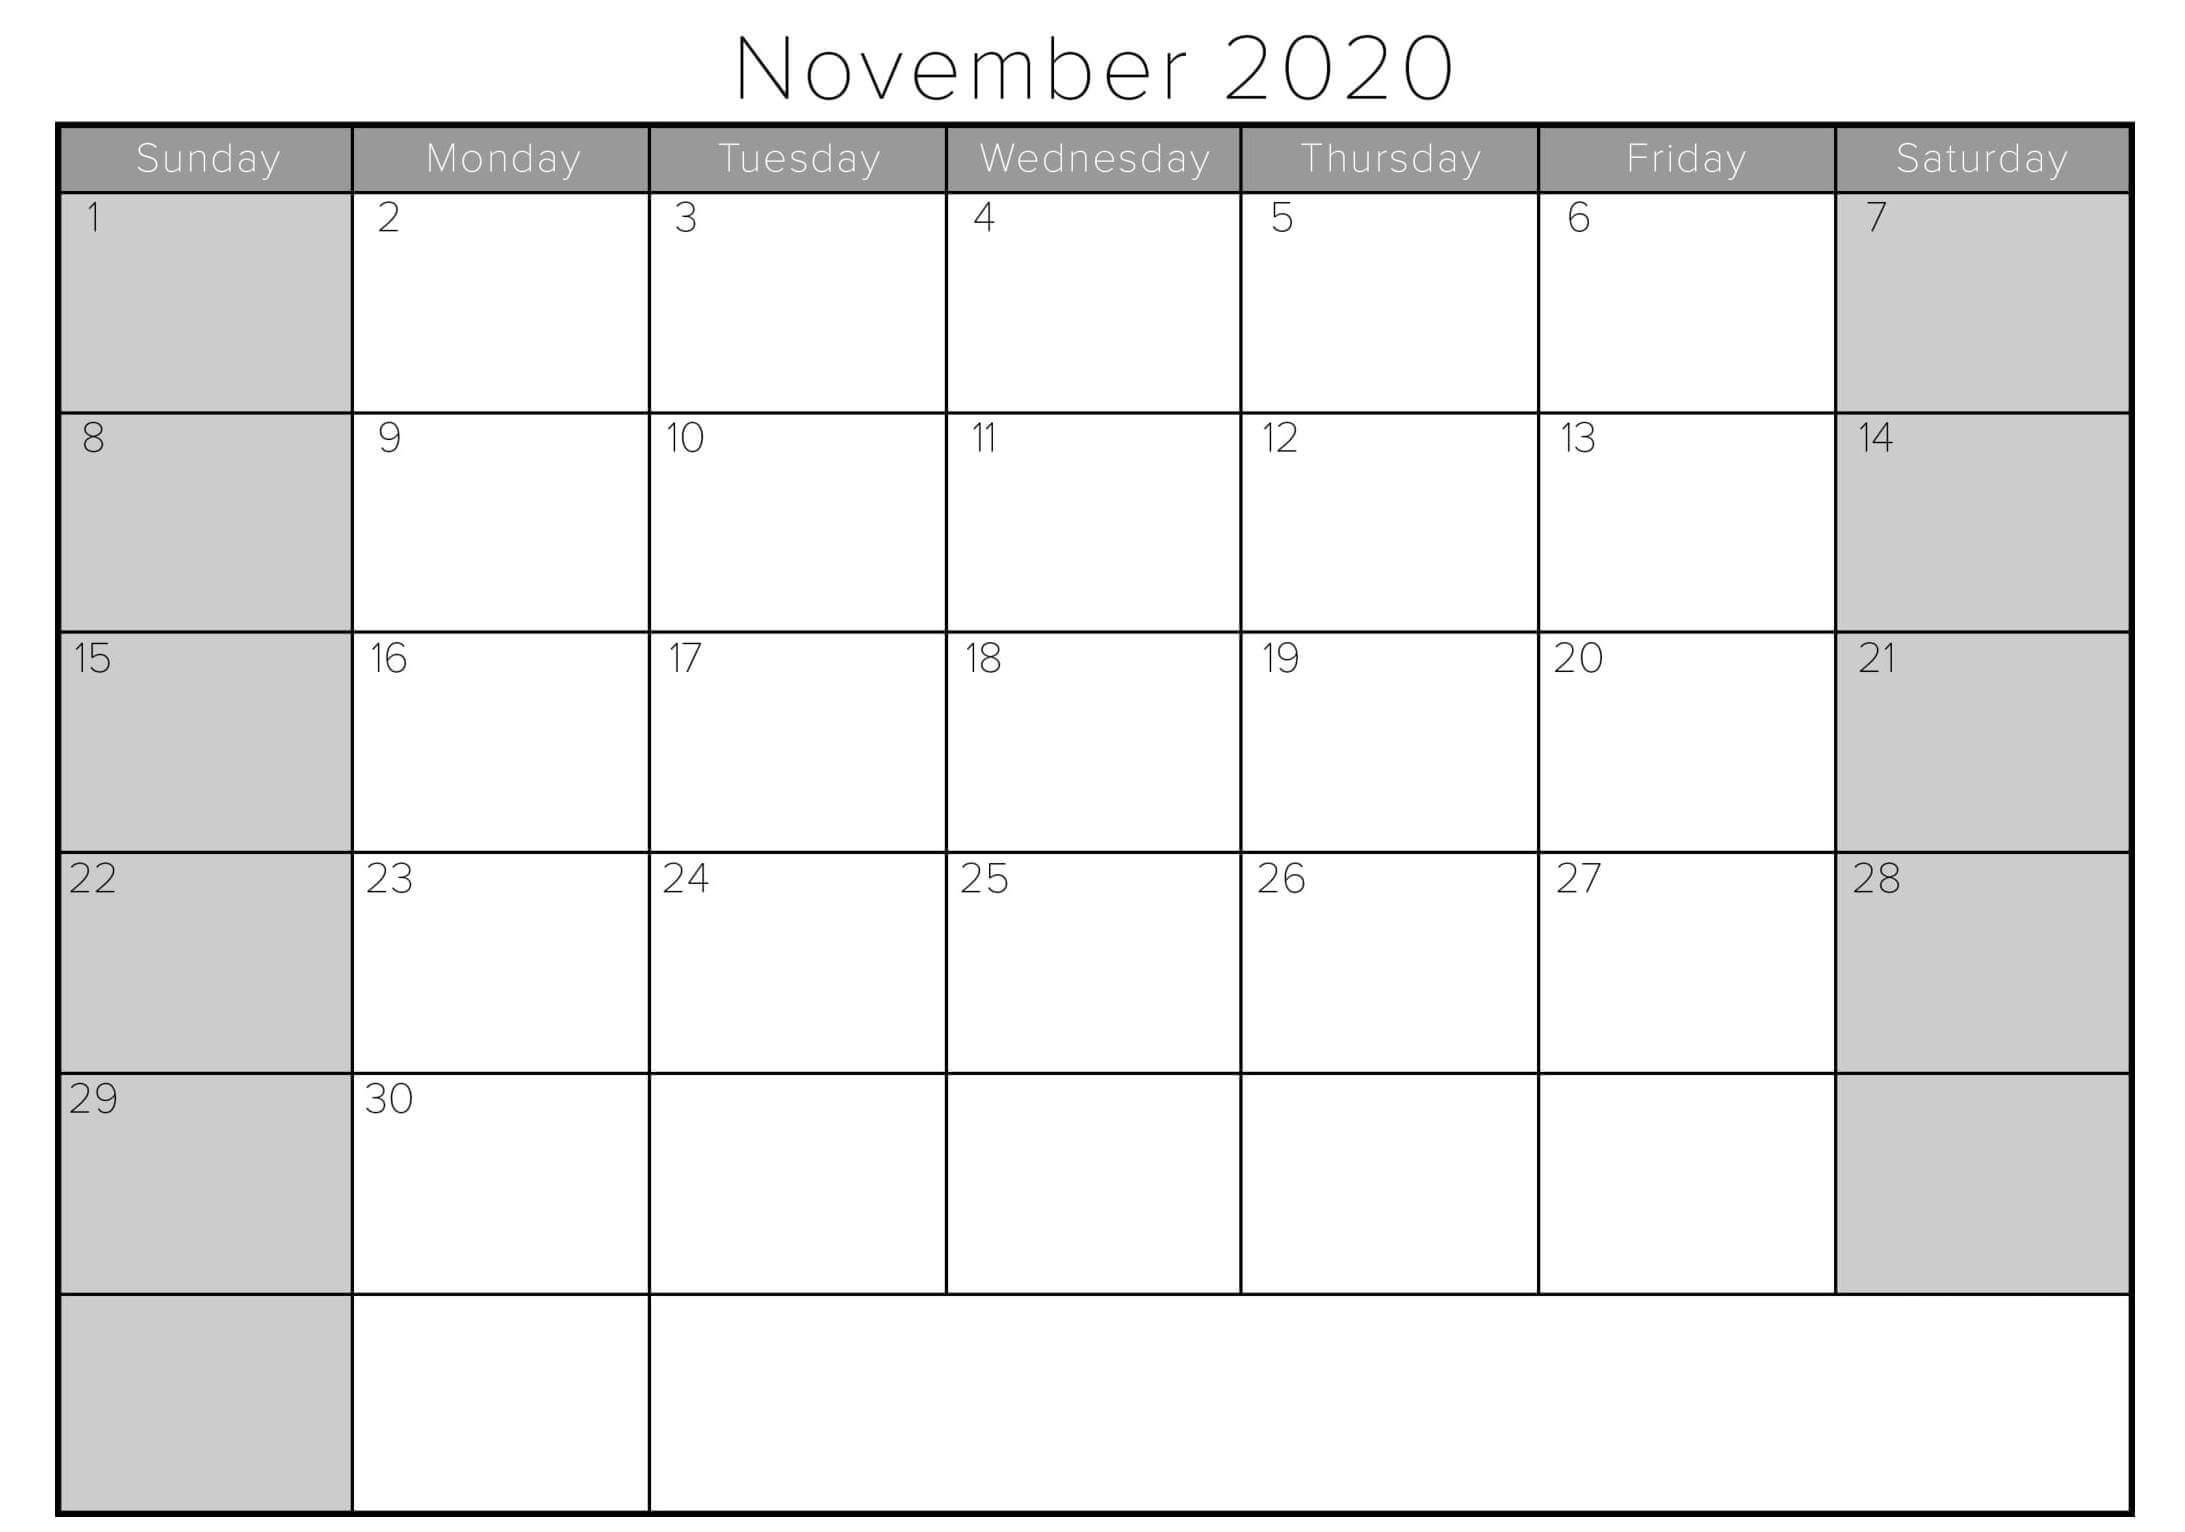 November 2020 Printable Calendar In Pdf Word Excel With